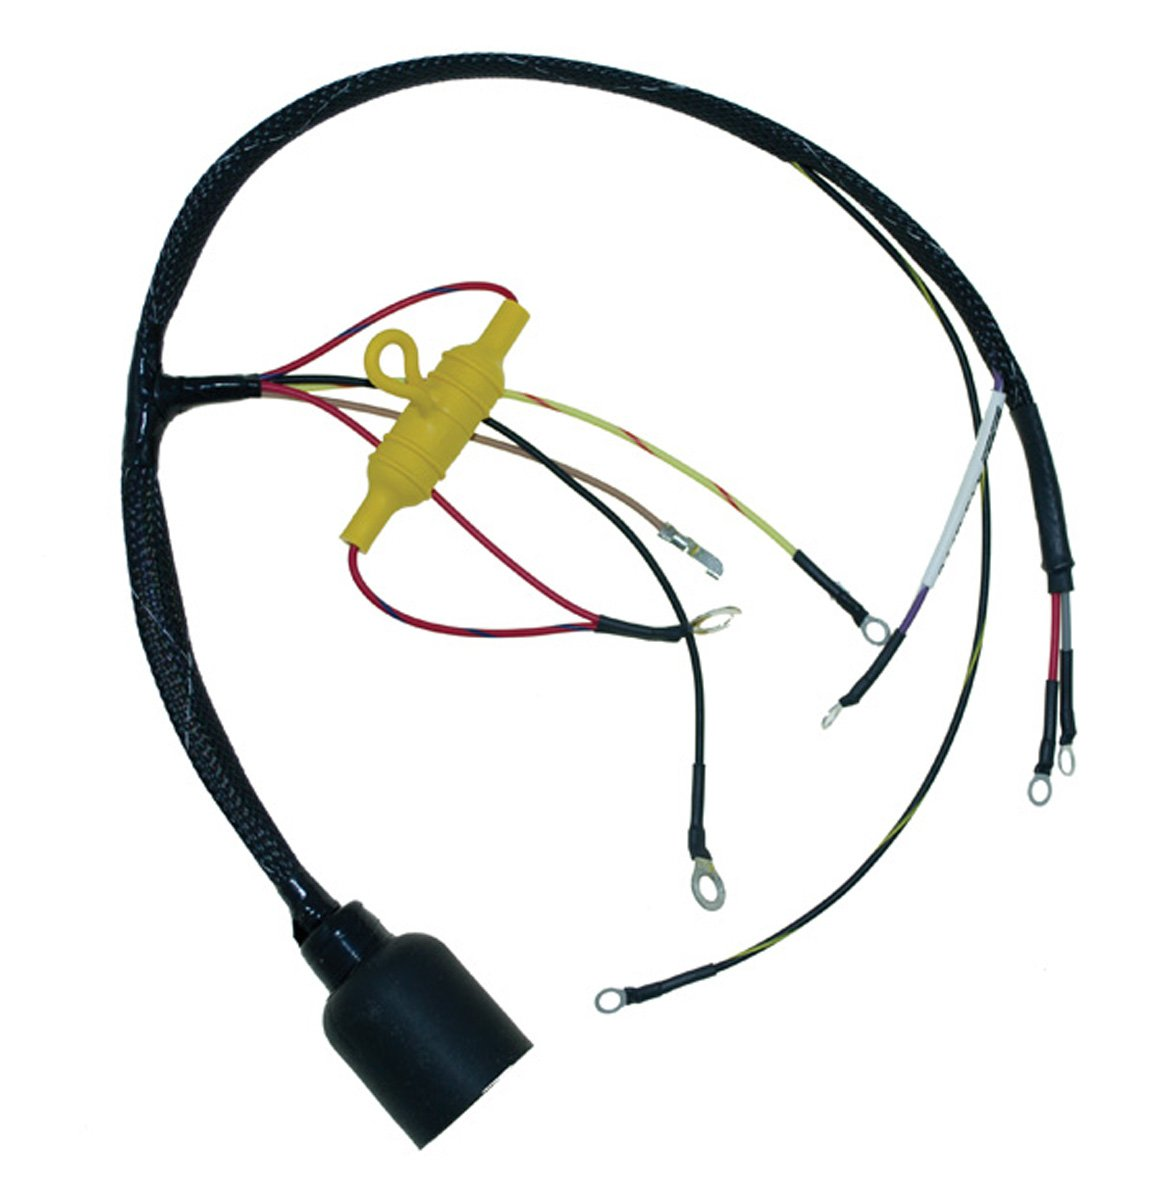 Johnson Evinrude Round Plug Internal Engine Wiring Pwc Harness 50 Hp 1973 2 Cyl Wsm 413 5776 Oem 385776 Automotive